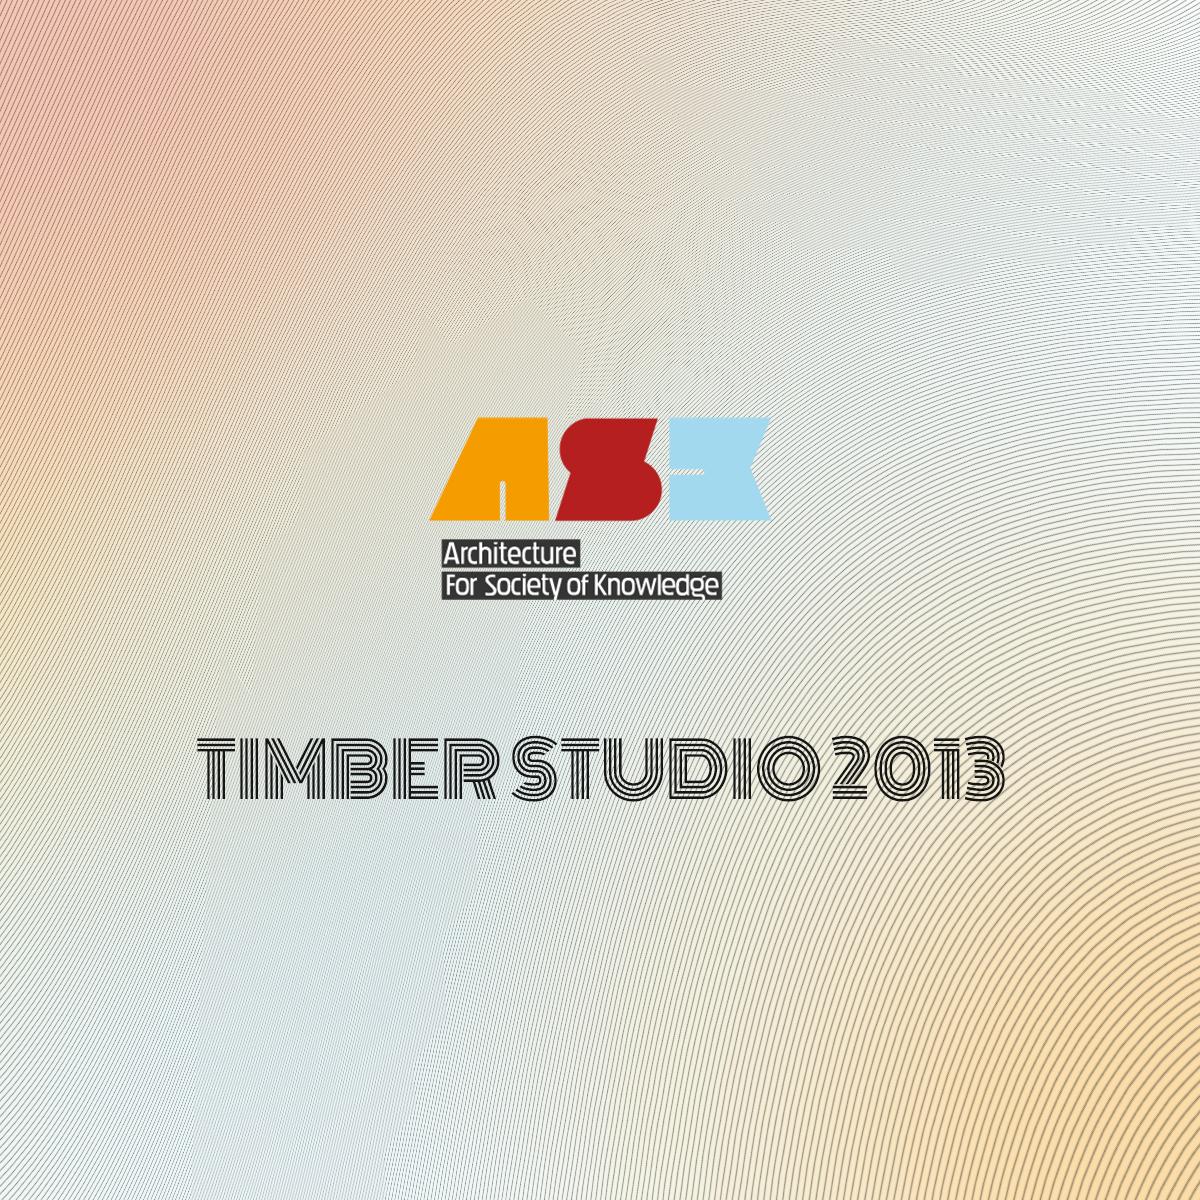 Timber Studio 2013